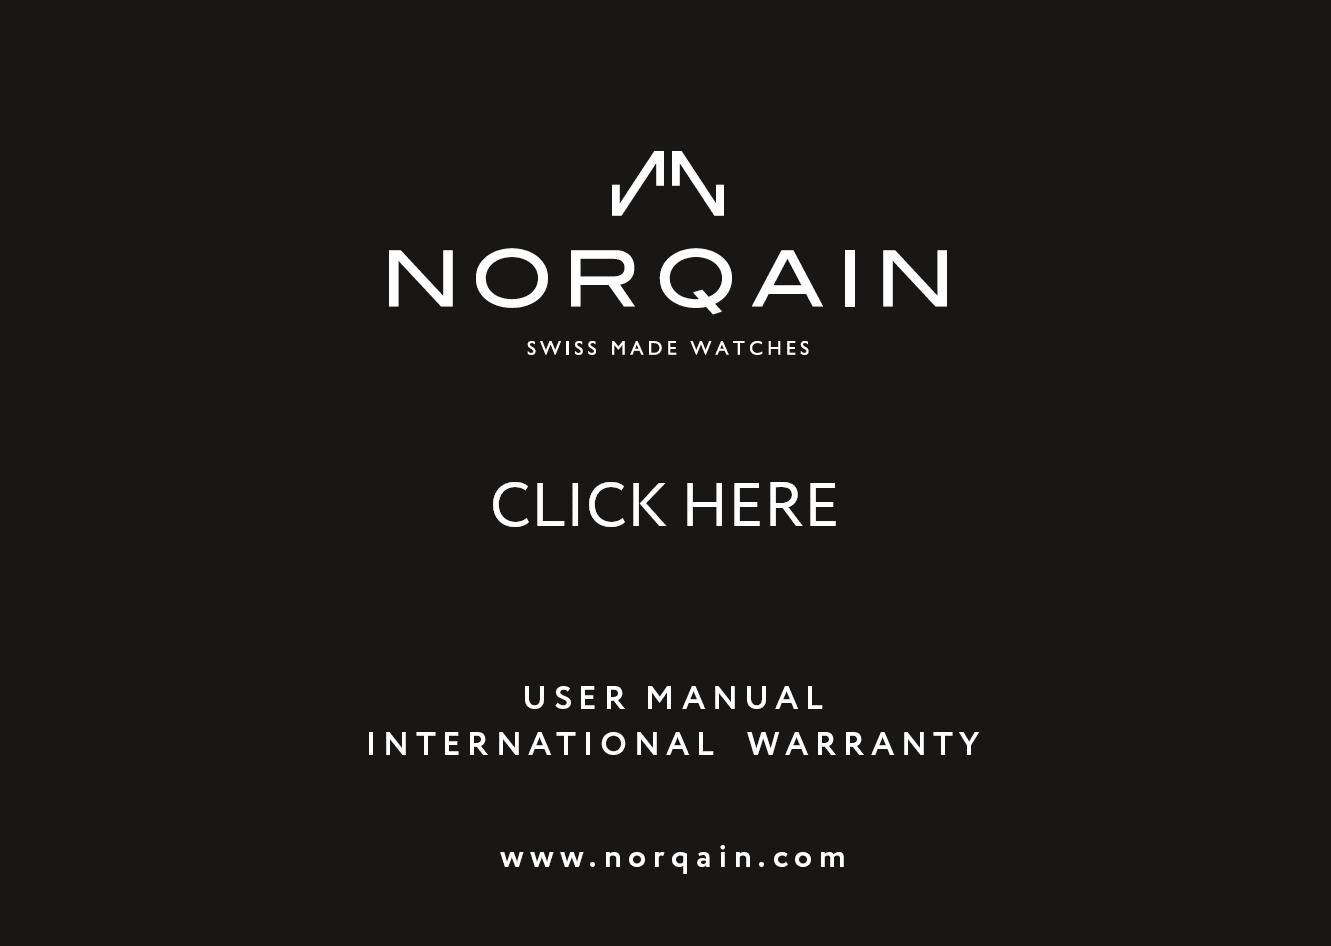 NORQAIN User Manual